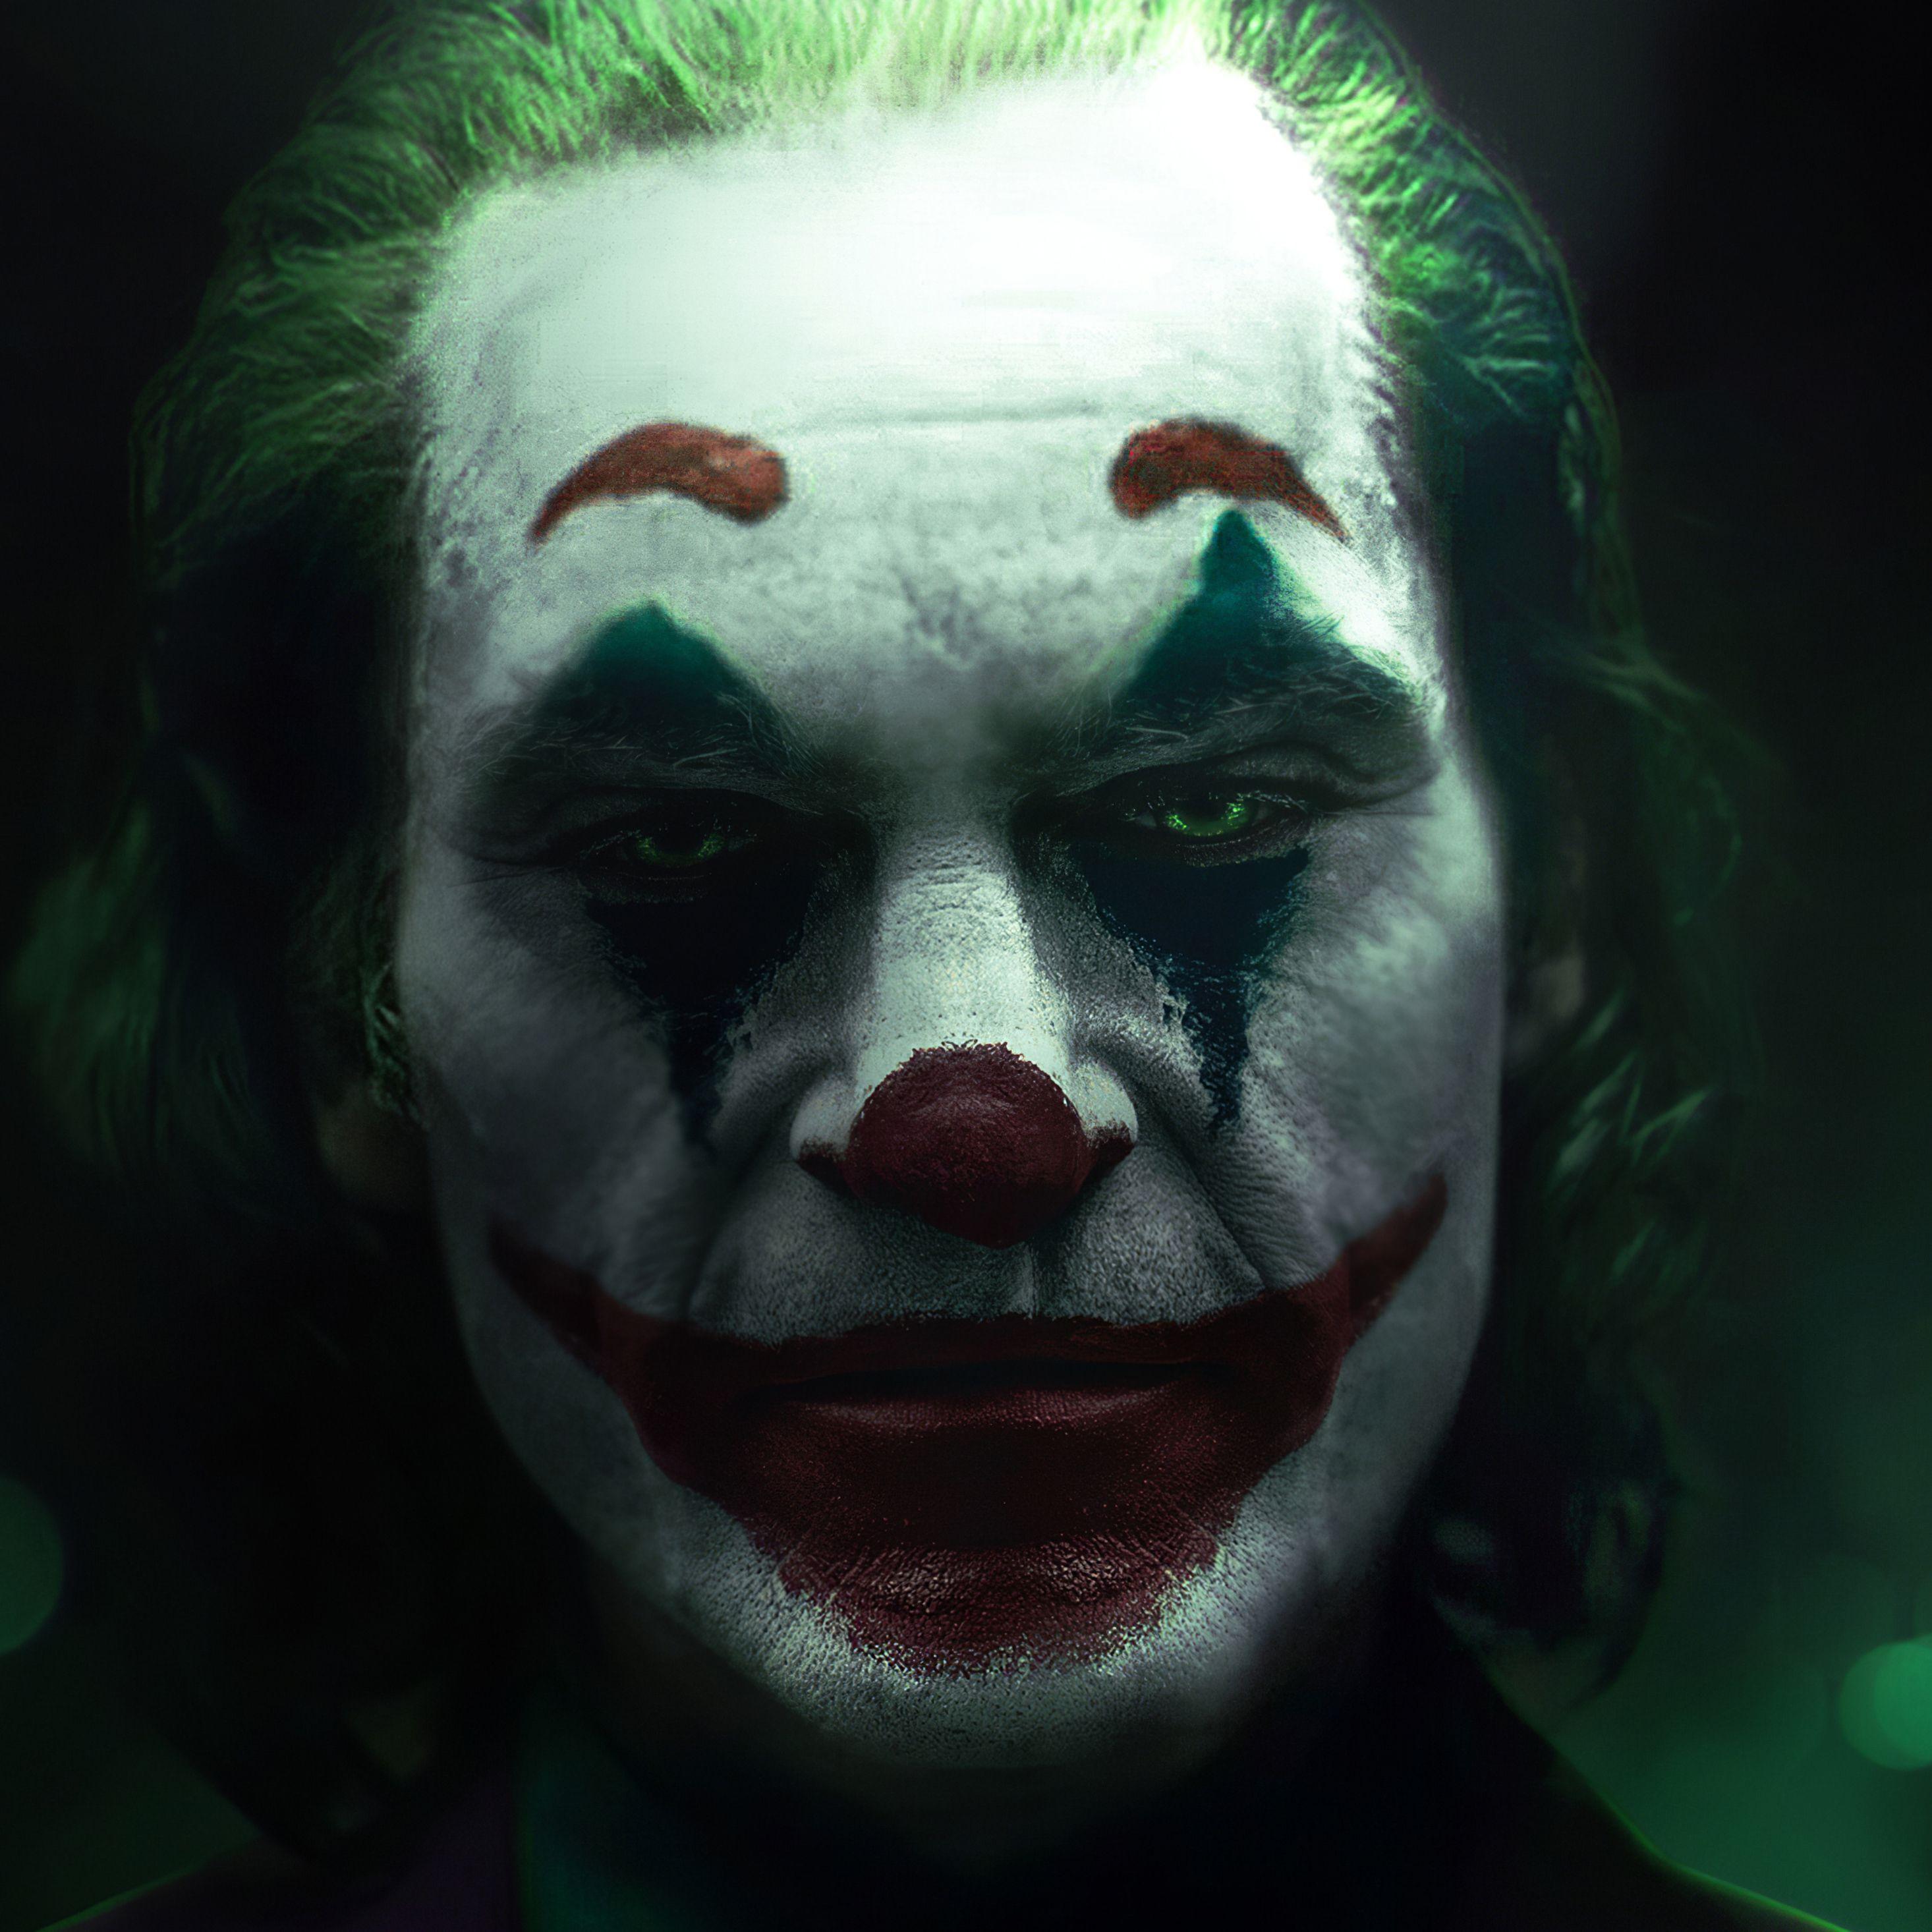 Joker 2020 Wallpapers Top Free Joker 2020 Backgrounds